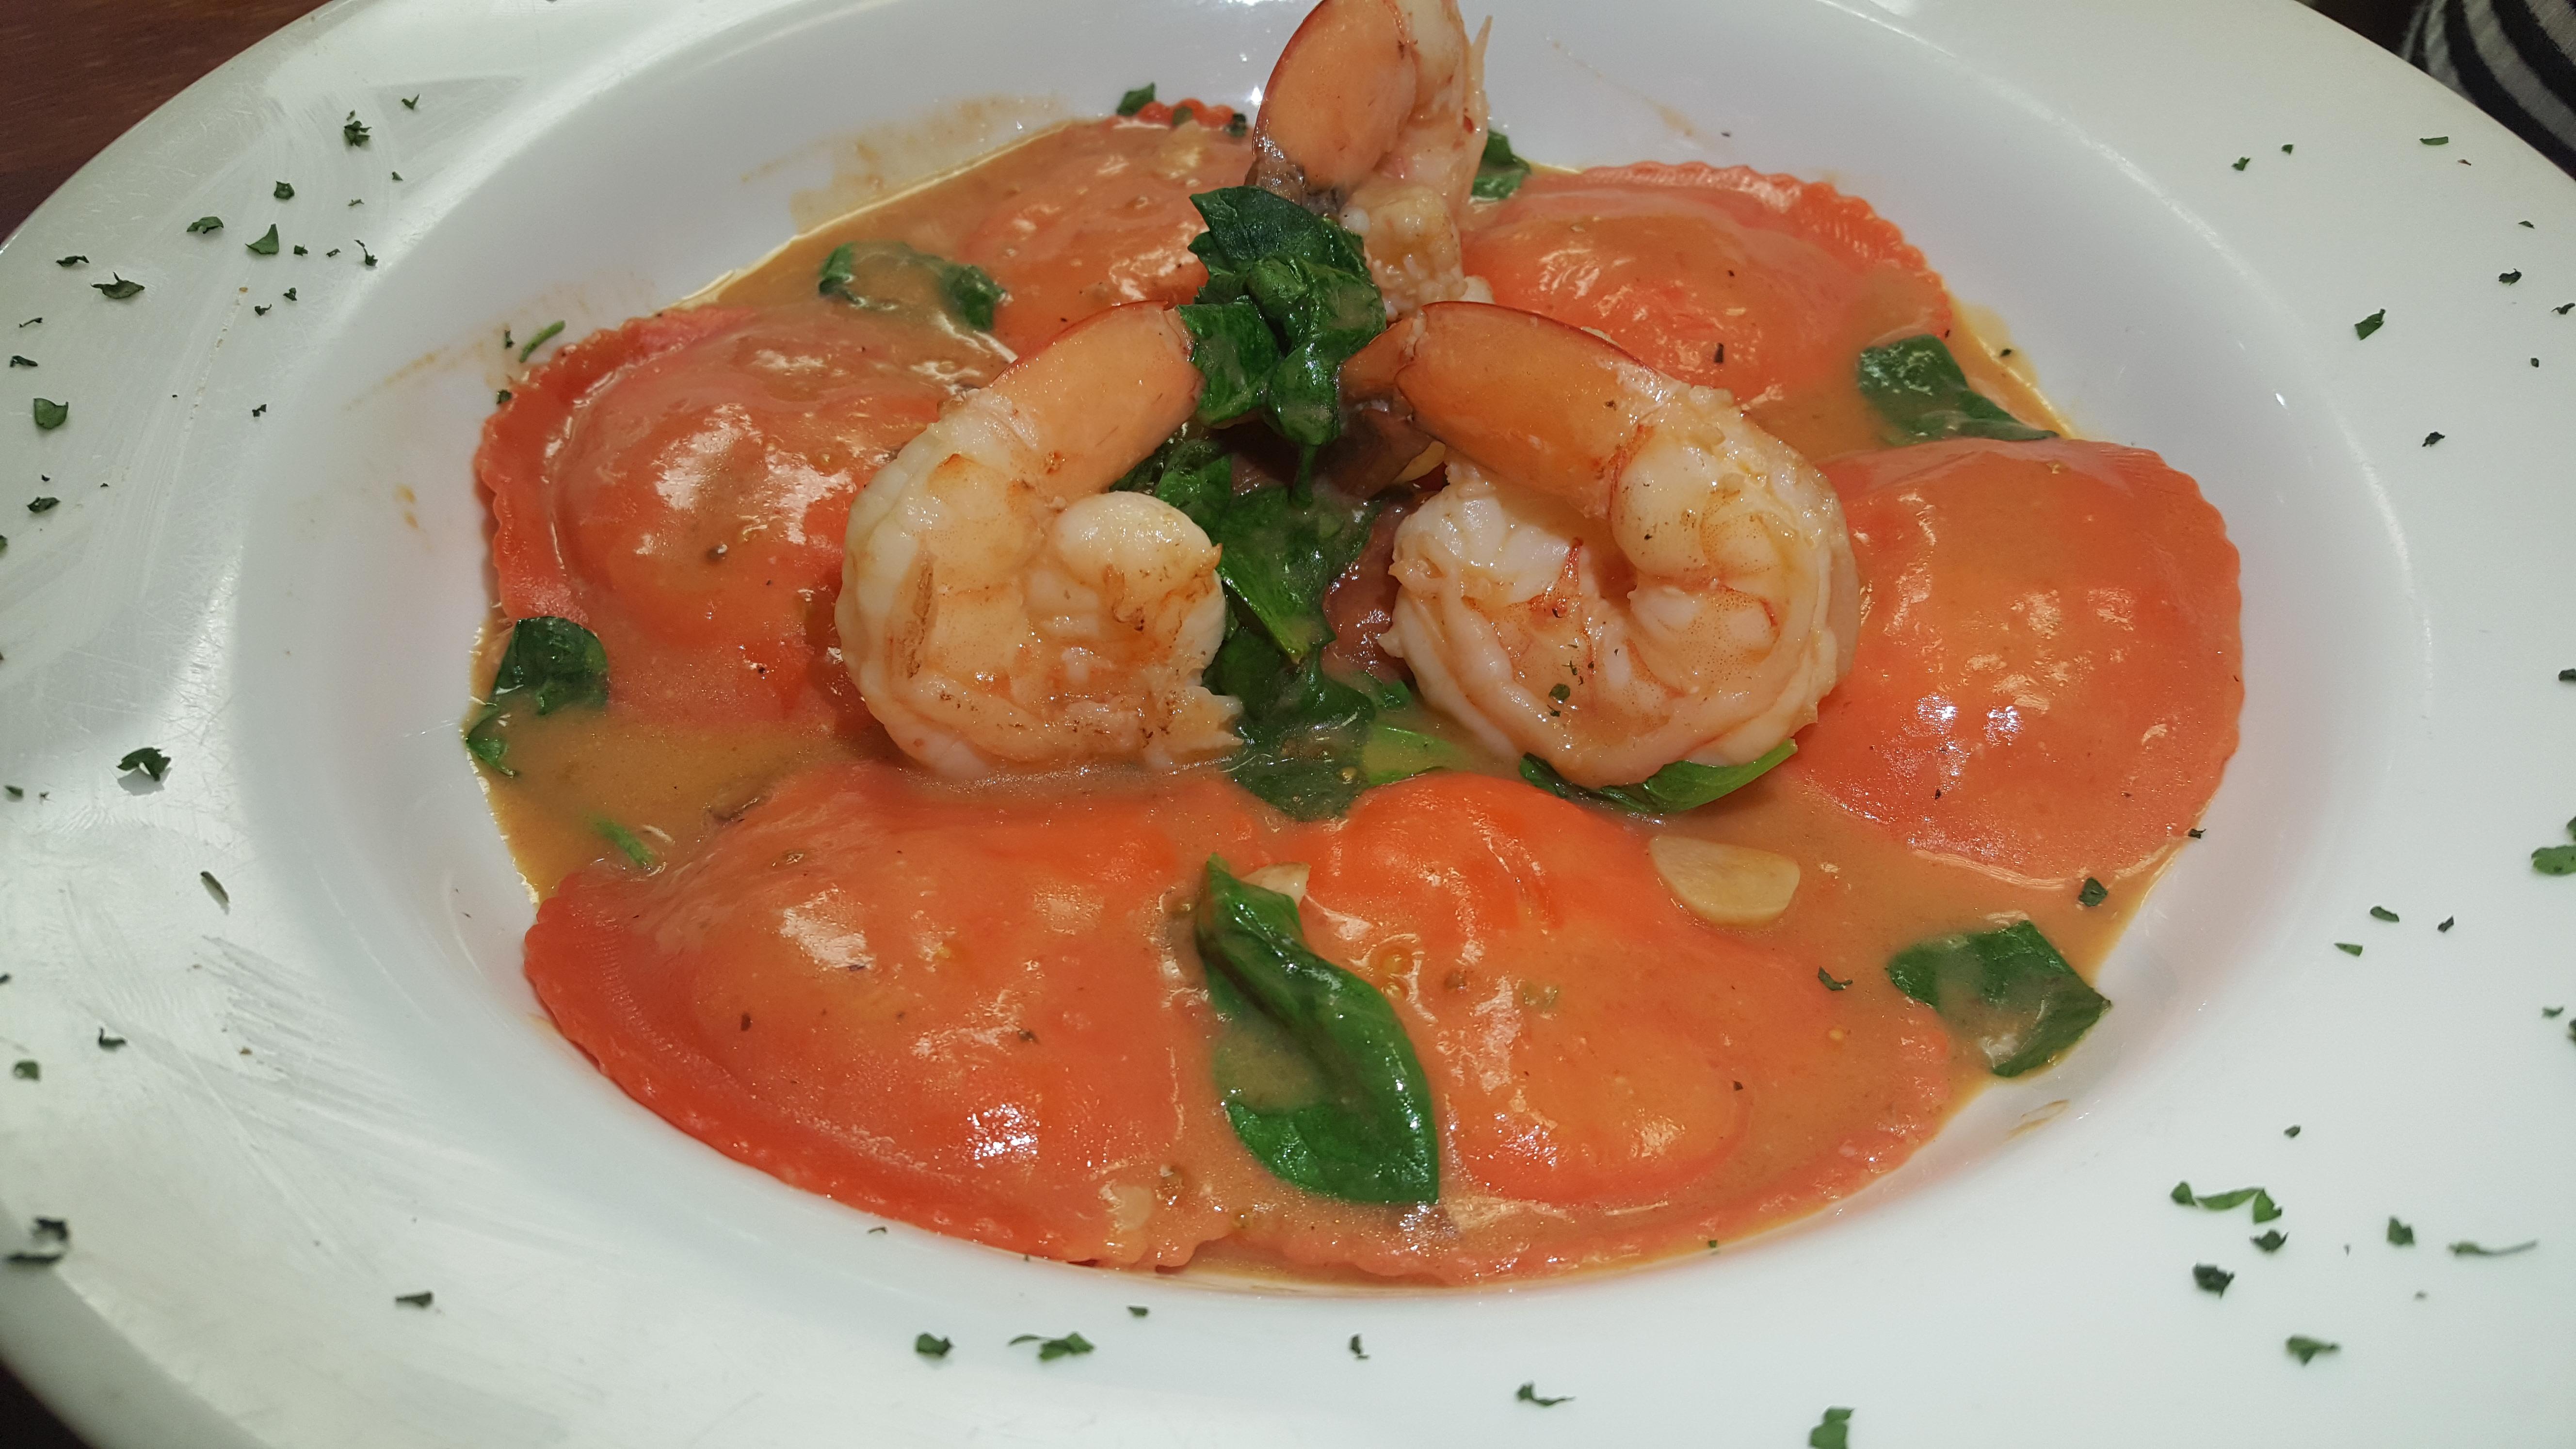 This weeks' homemade pasta special: Lobster Ravioli